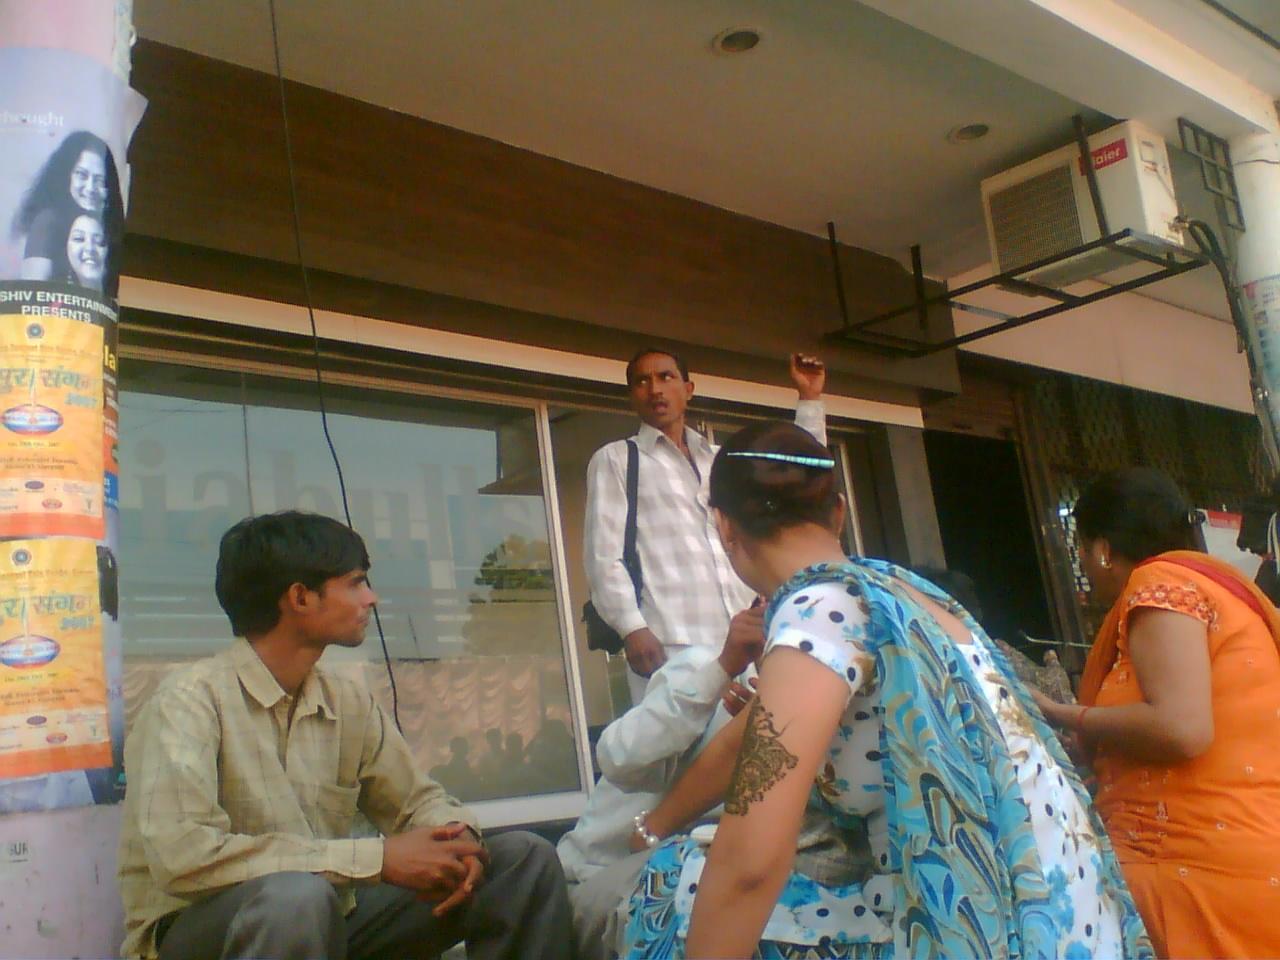 Indian hidden camera